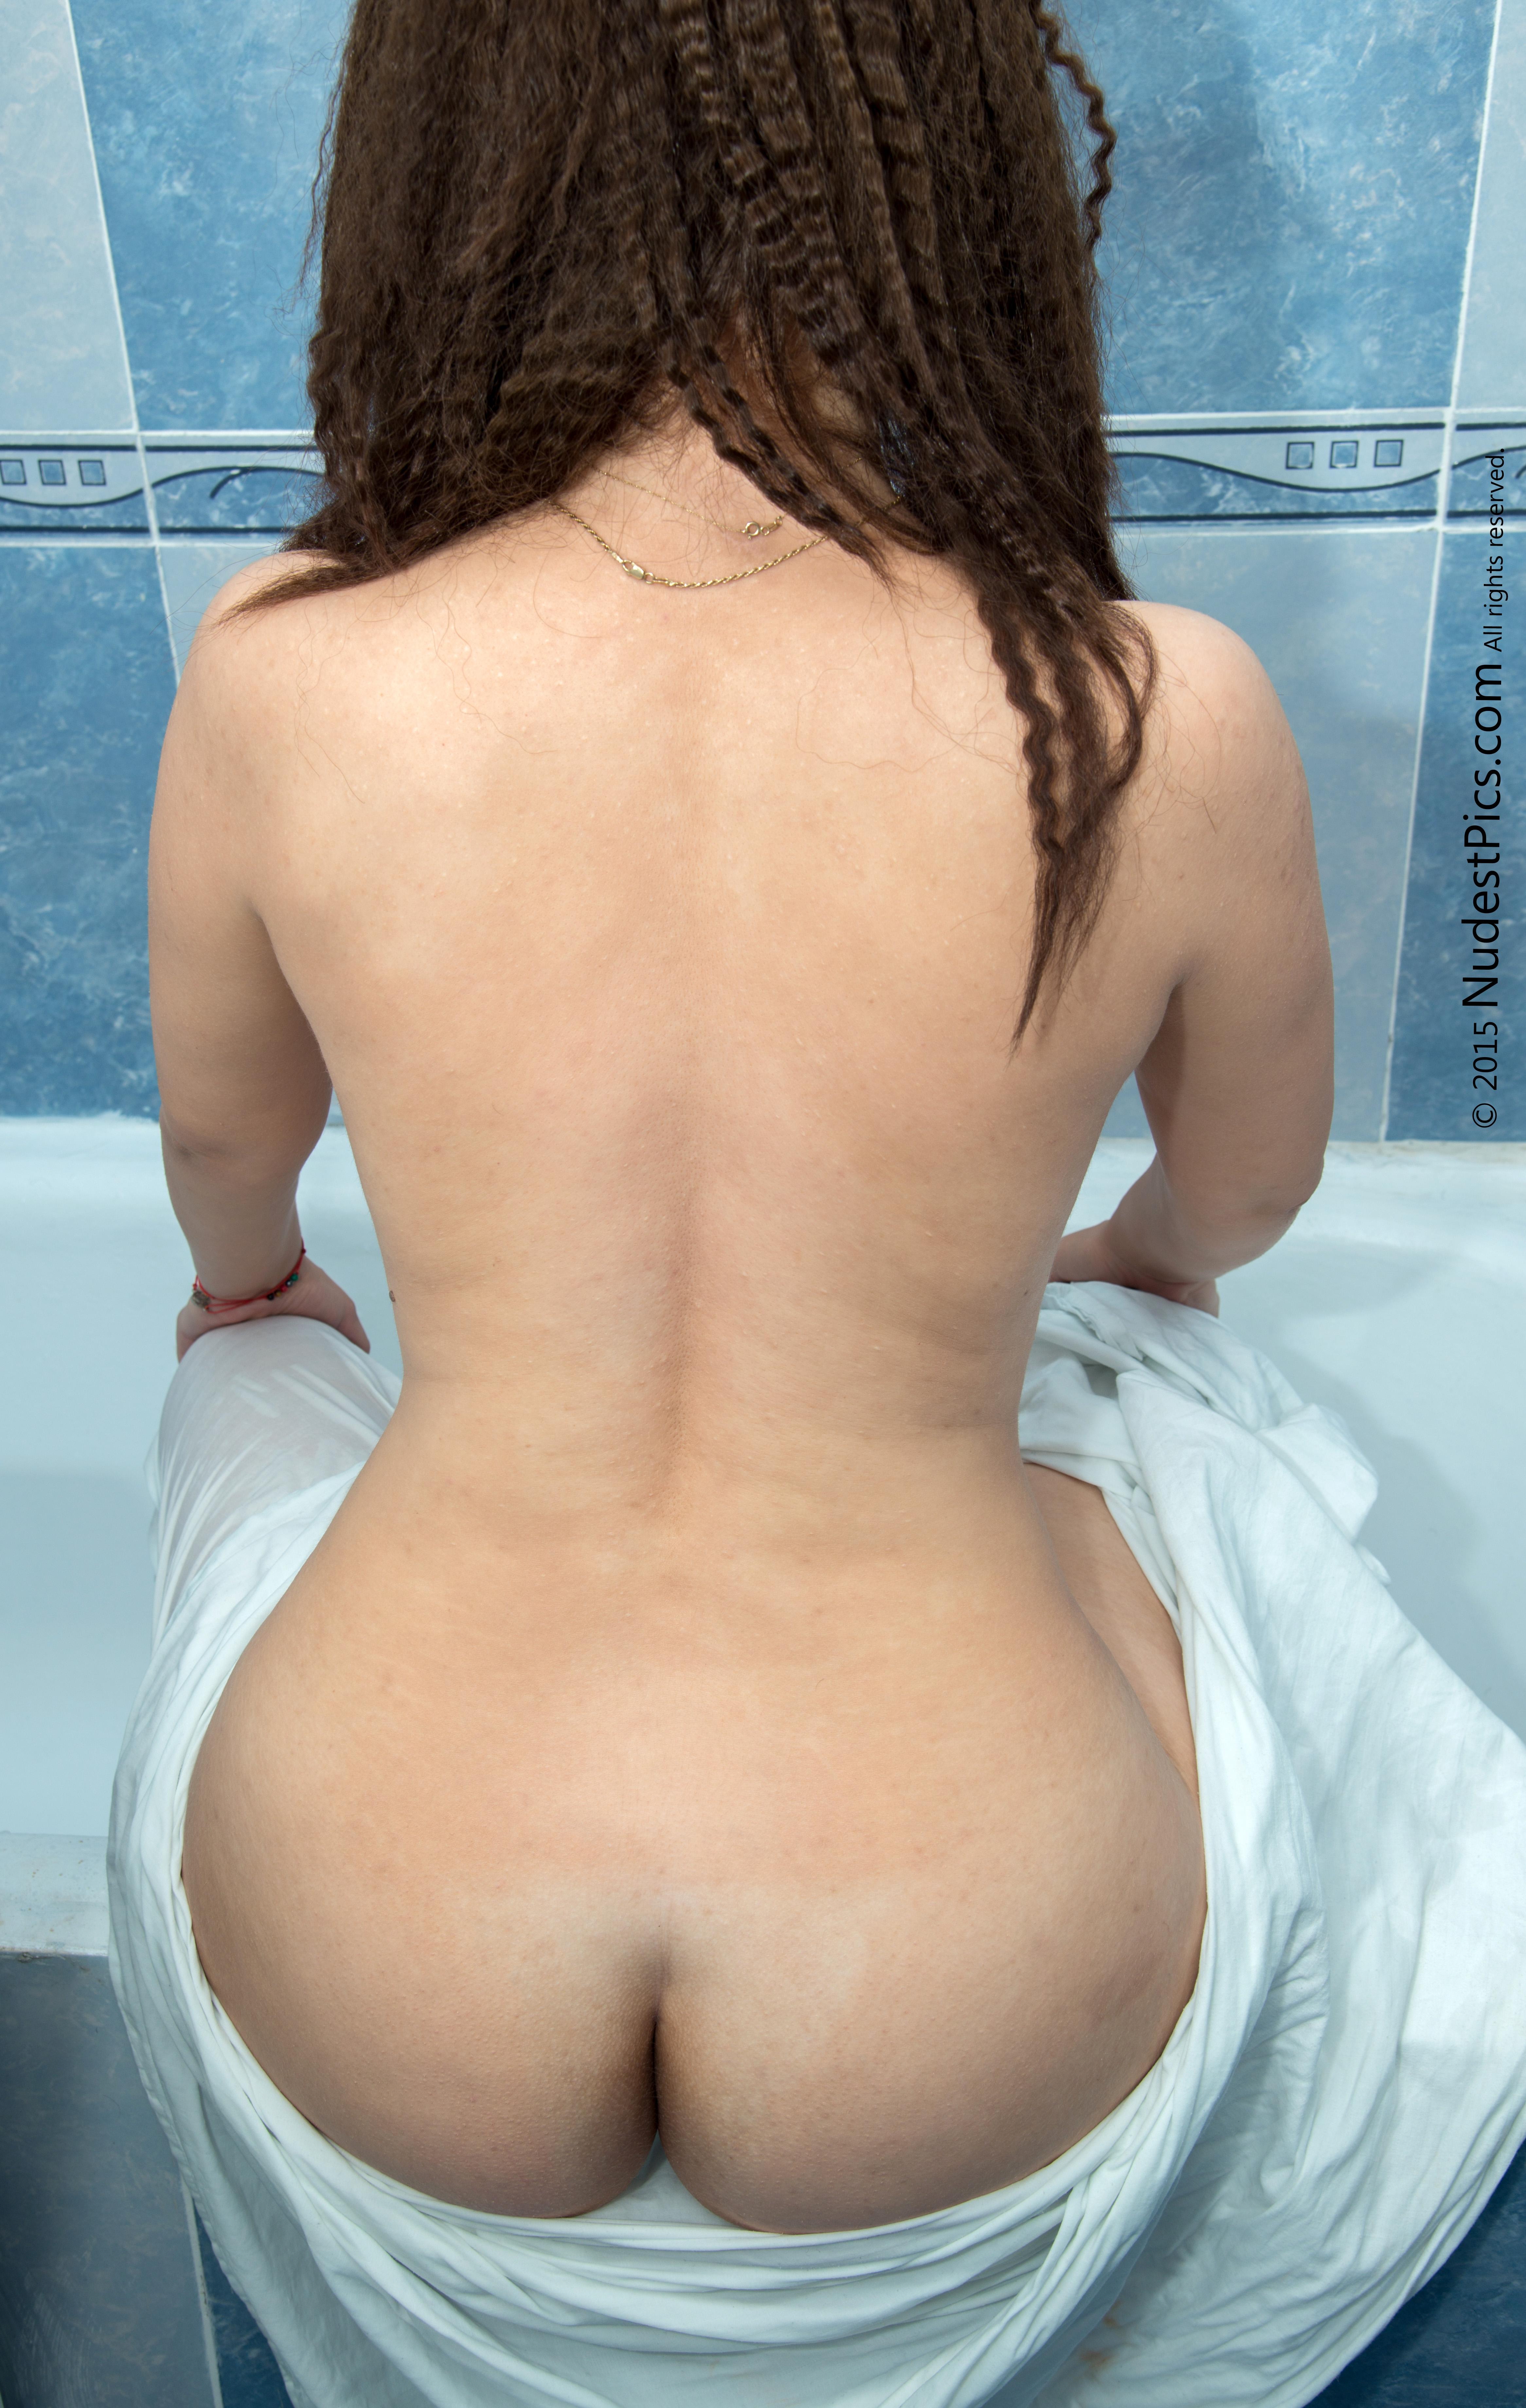 Naked Girl Back Round Booty Sitting on Bathtub